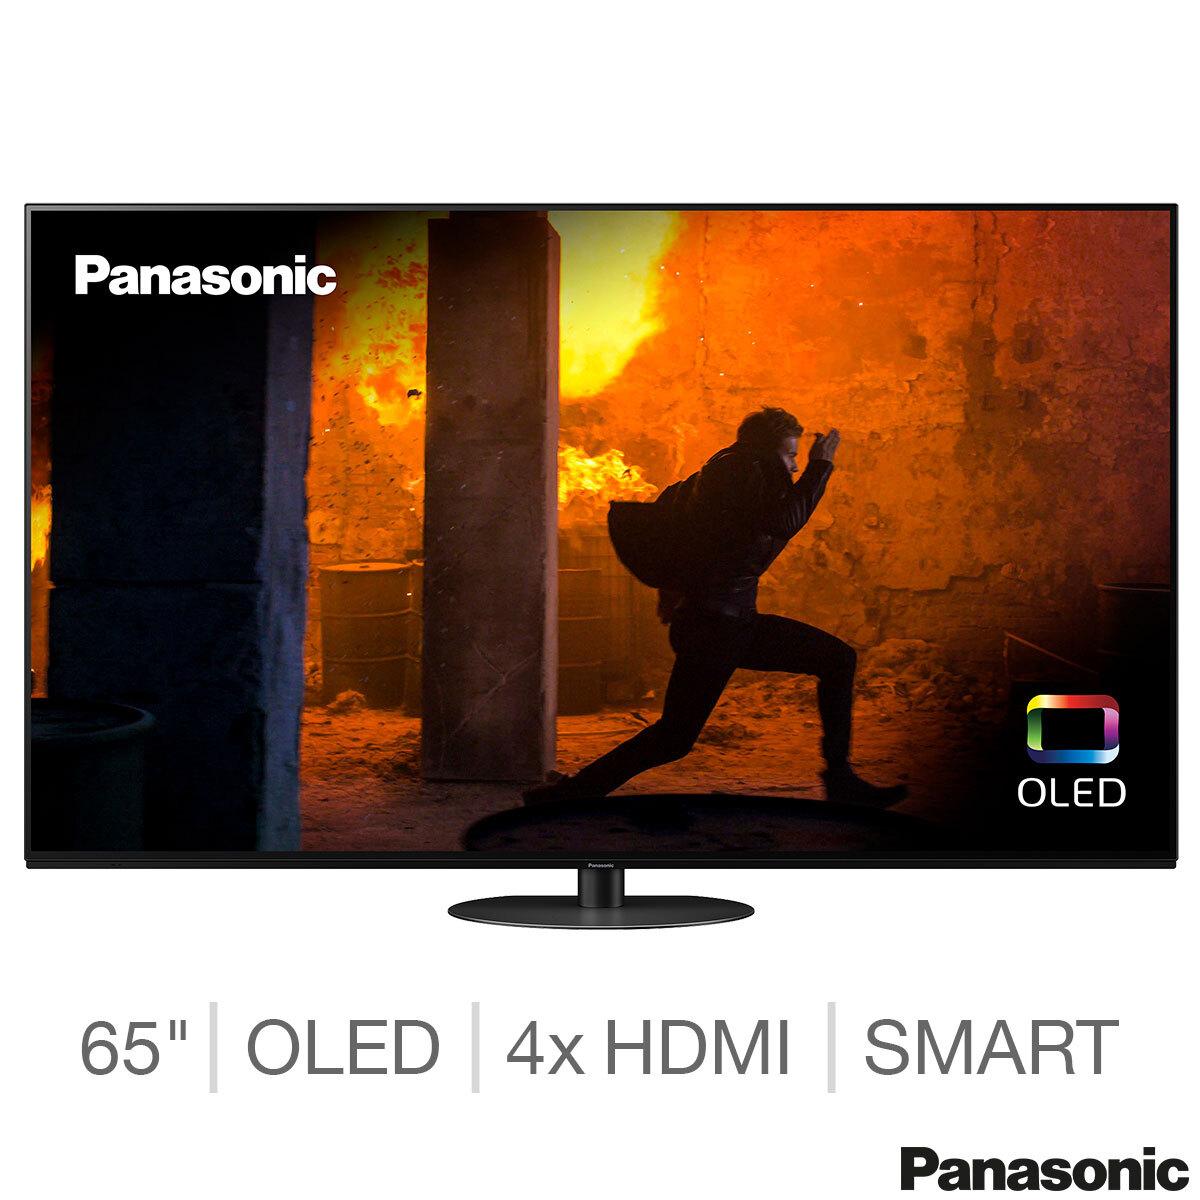 "Panasonic 65HZ980B 65"" OLED 4K UHD Smart TV (2020)- £1399.99 /or 55HZ980B 55""- £999.99 +FREE SC-HTB400EBK Soundbar @ Costco (+5 yr warranty)"